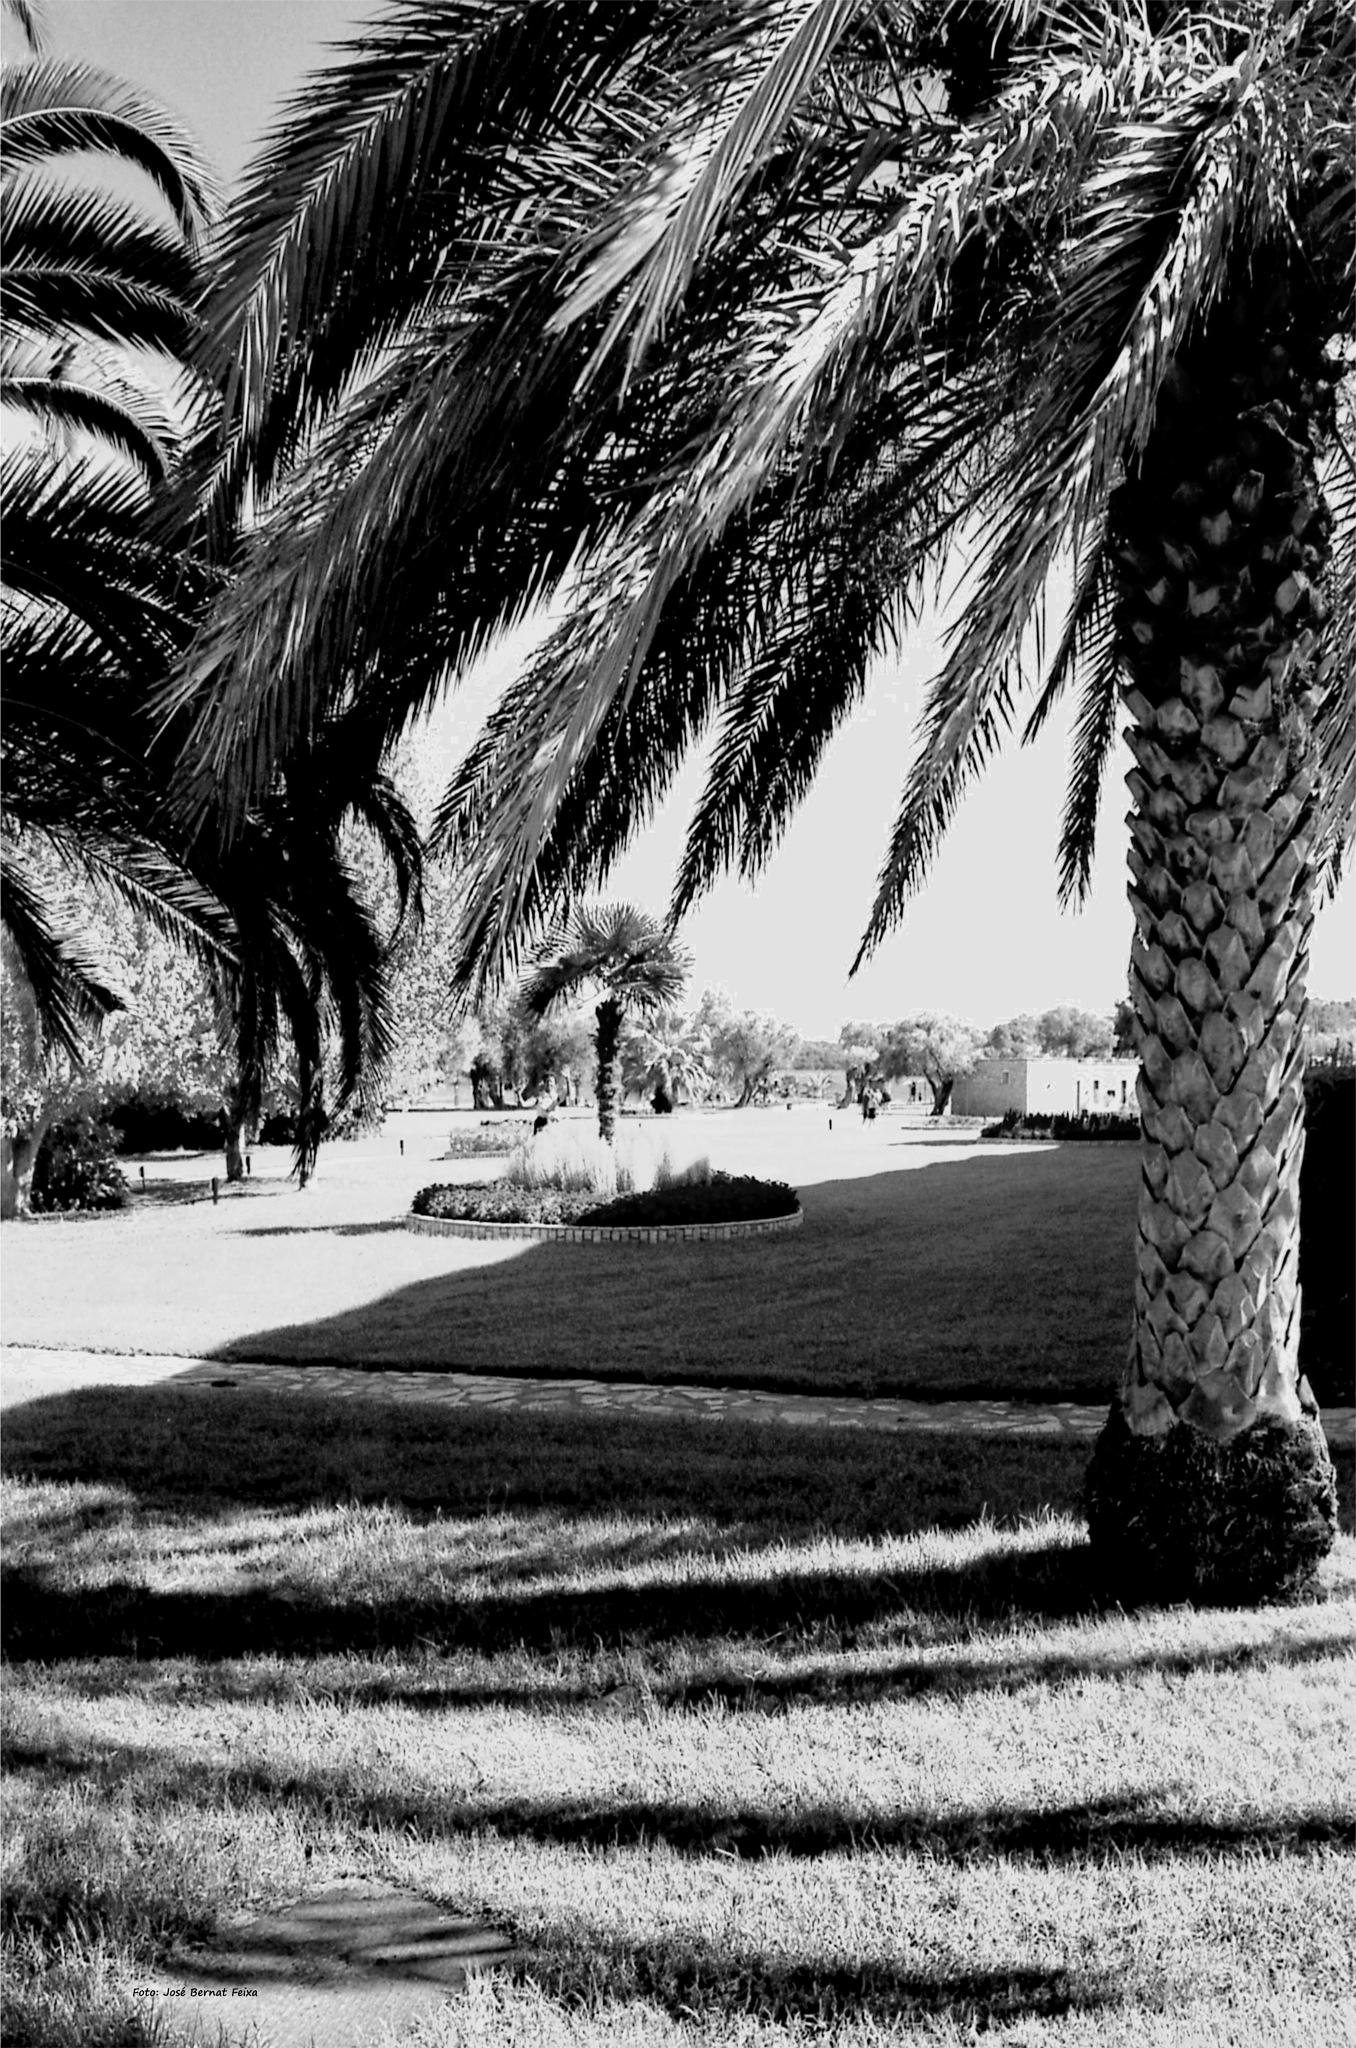 PALMERAS Y SOMBRAS ; PALMBOMEN EN SCHADUWEN ; PALM TREES AND SHADOWS by José Bernat Feixa